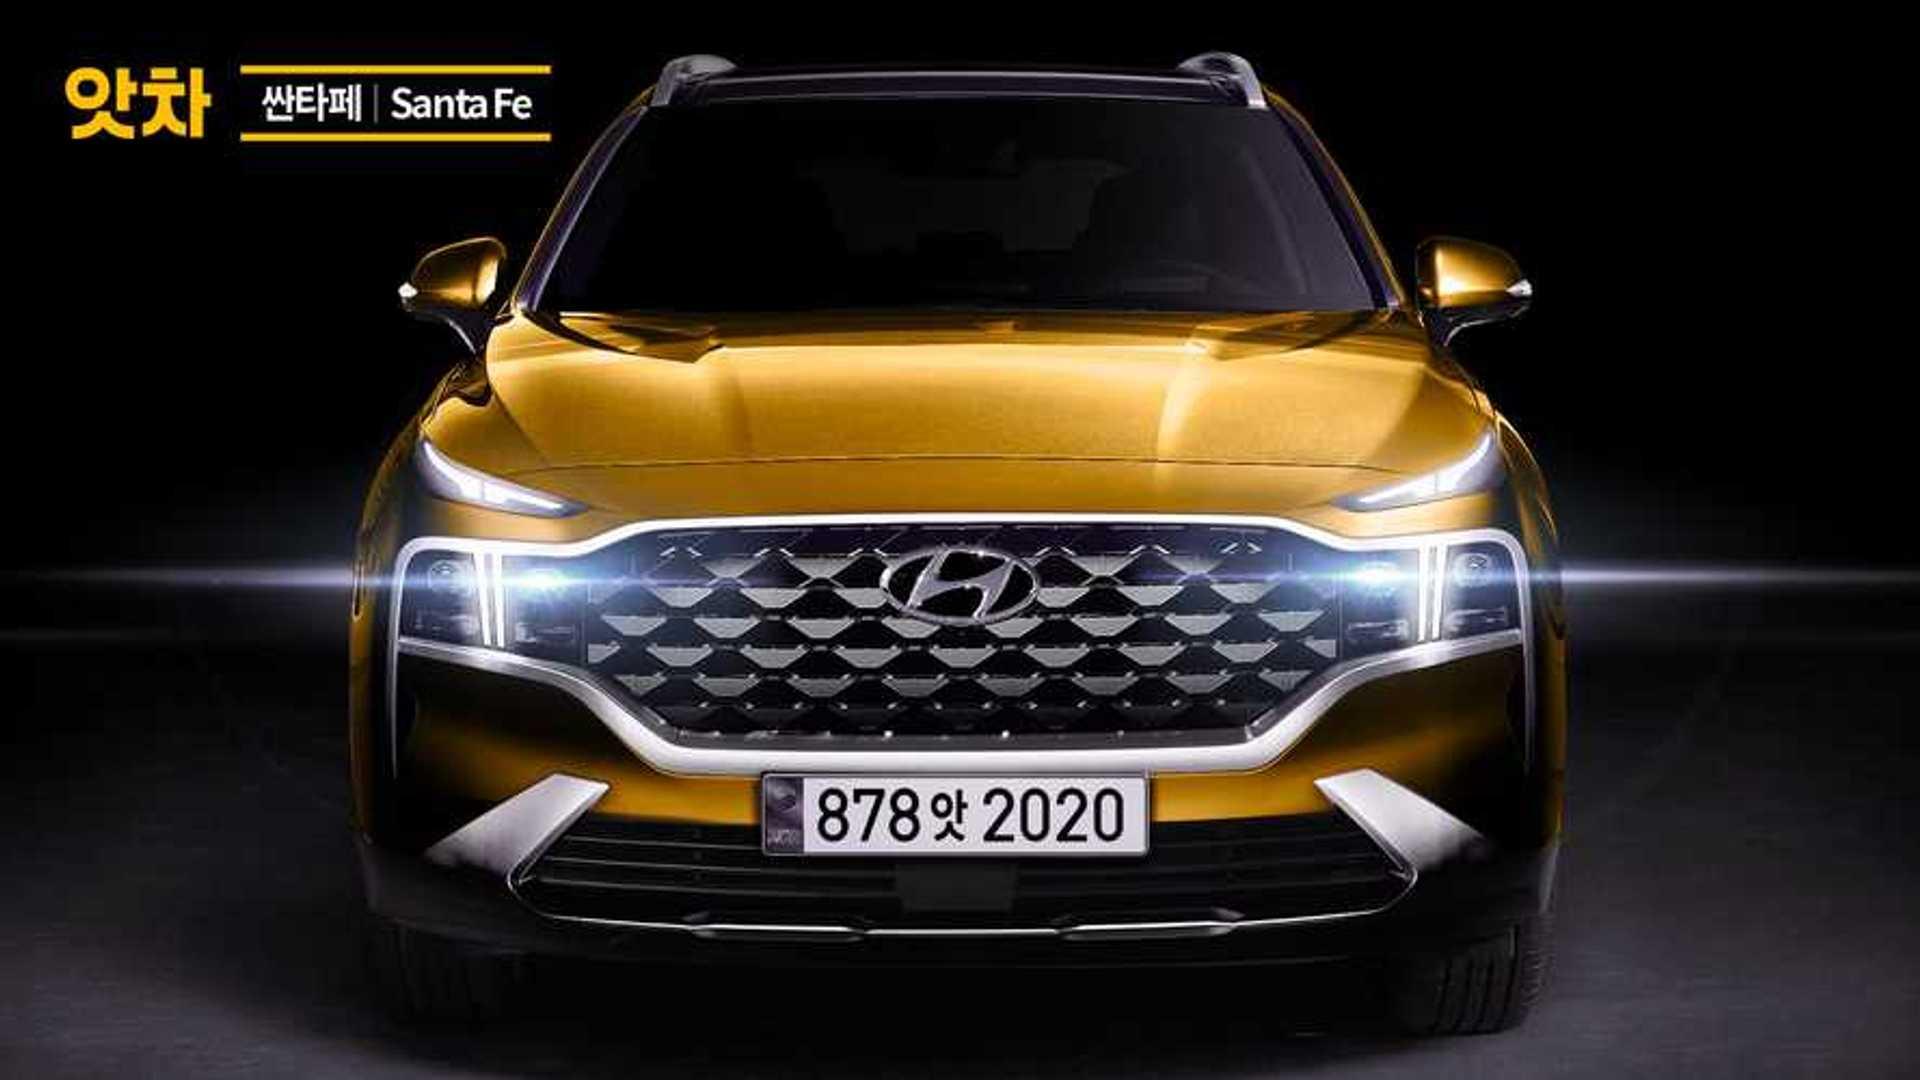 Novo Hyundai Santa Fe 2021 Ganha Projecao Realista Apos Teaser Oficial